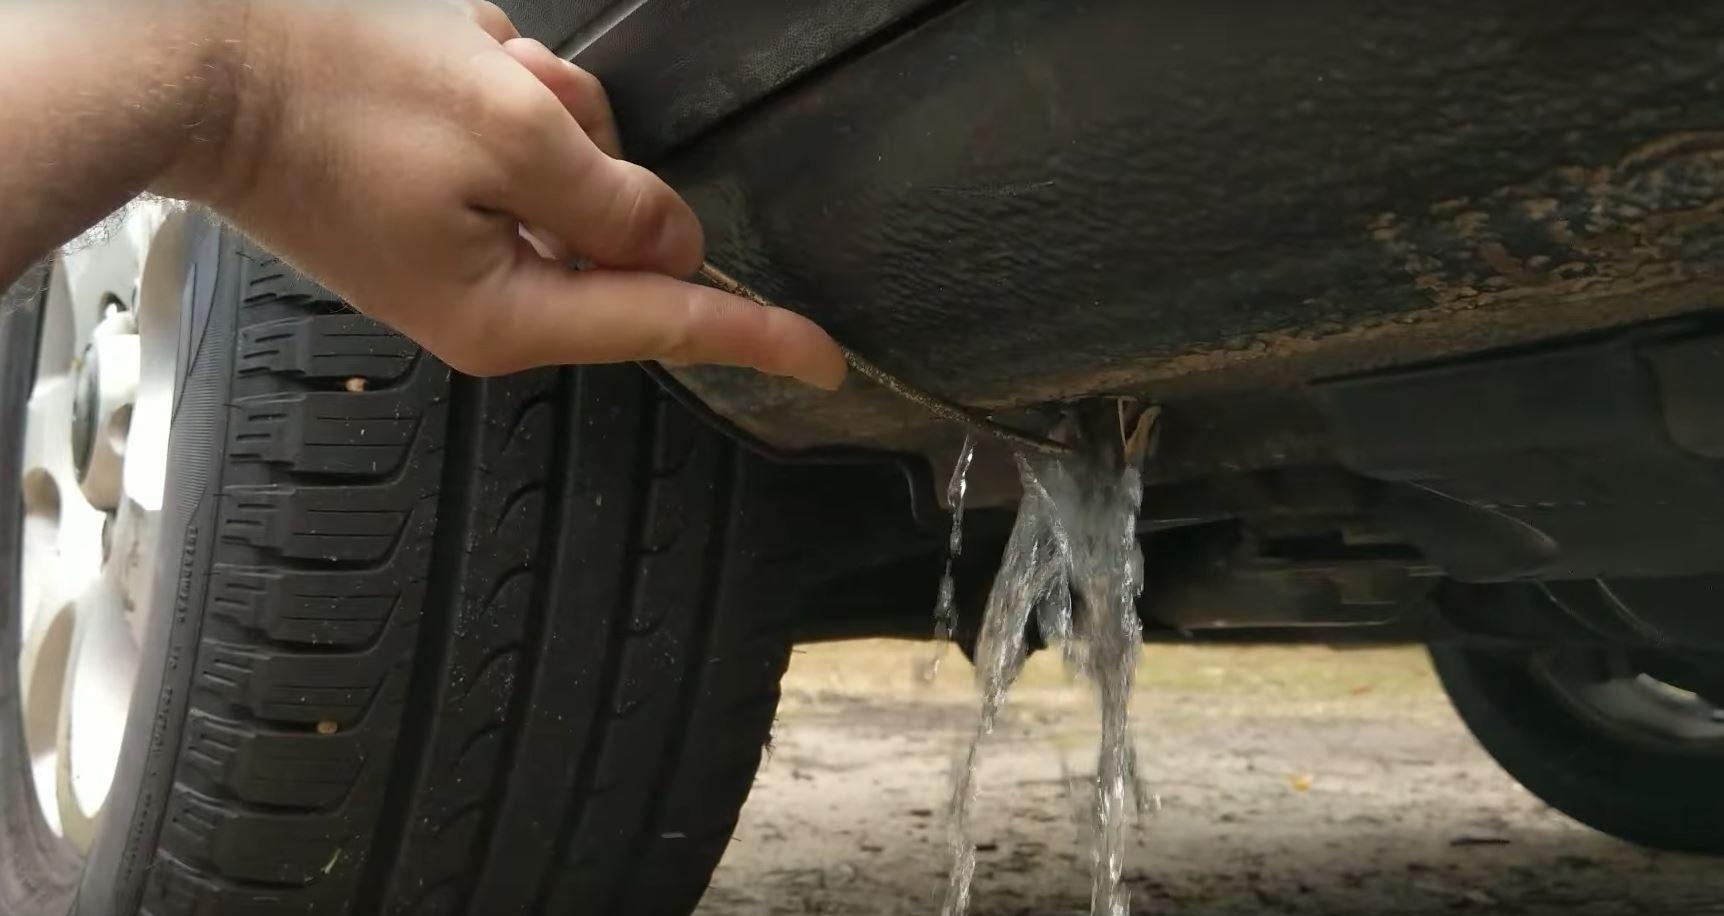 Volkswagen Touareg 7L Has a Water Retention Problem Thanks